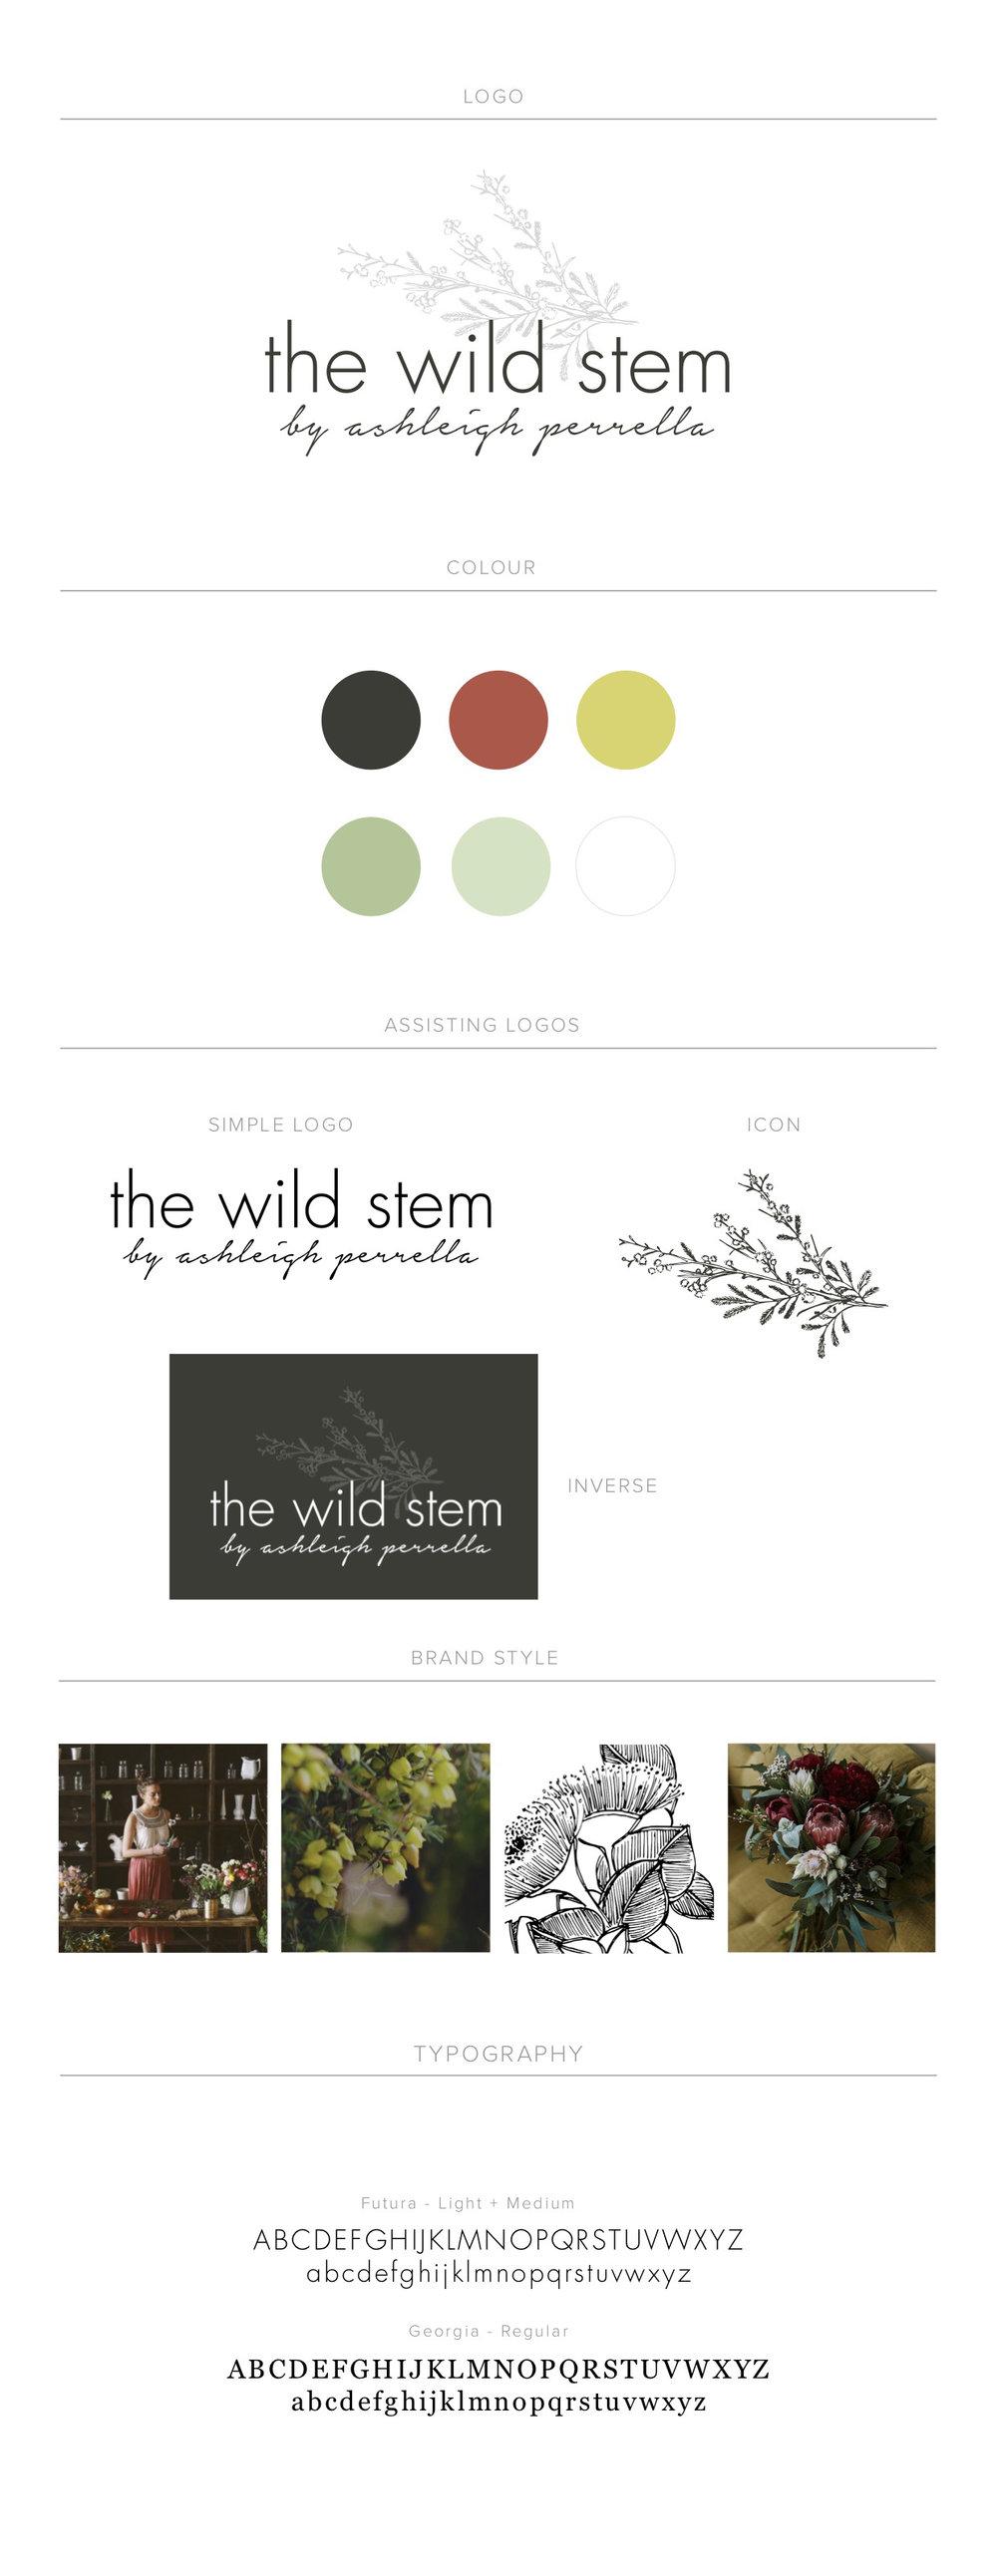 Brand-Summary-The-Wild-Stem-1.jpg